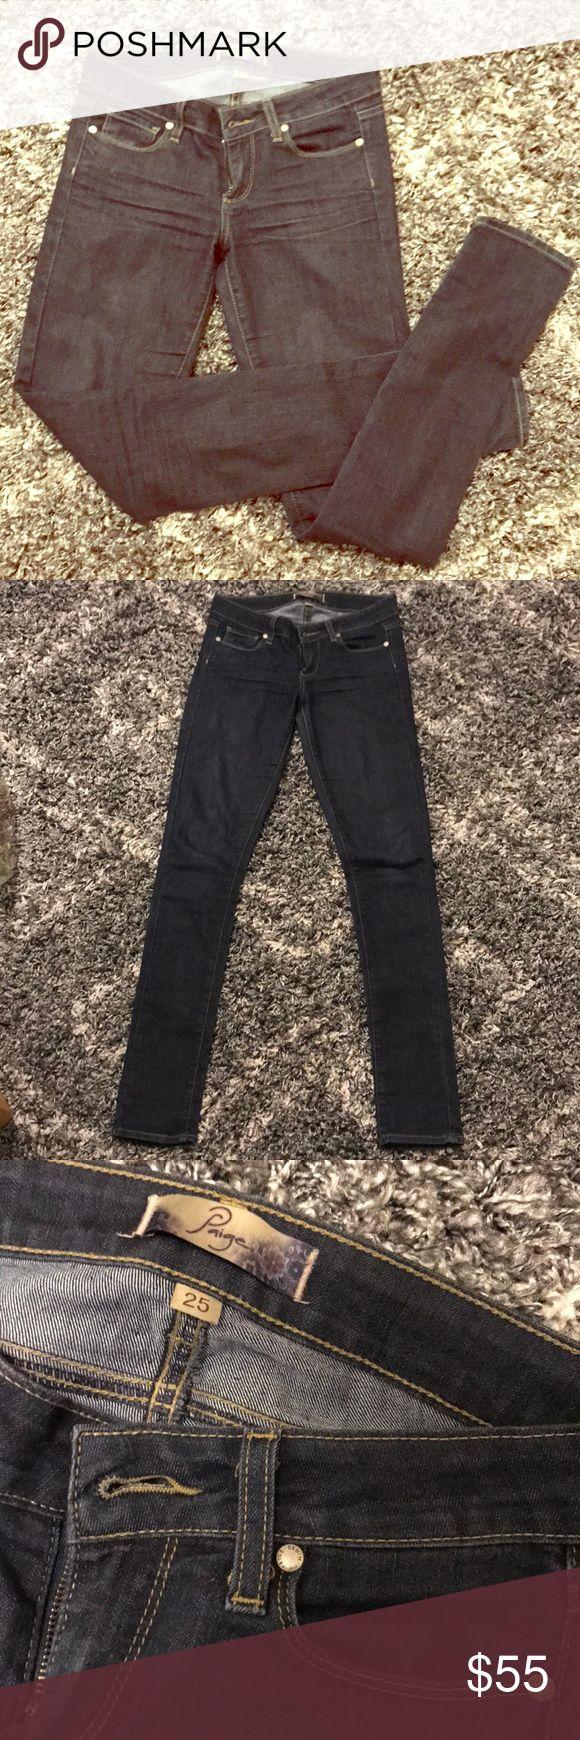 Paige peg skinny jeans Dark wash Peg Skinny fit PAIGE Jeans Skinny